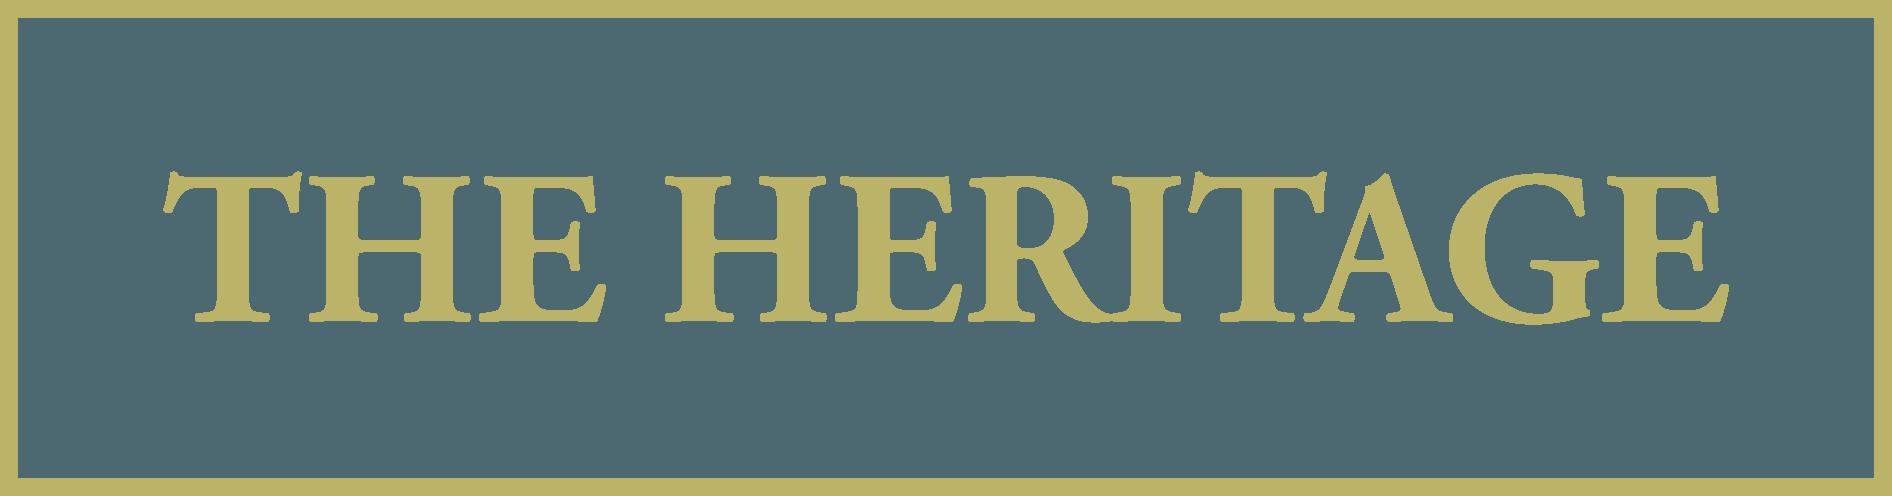 The Heritage Bar